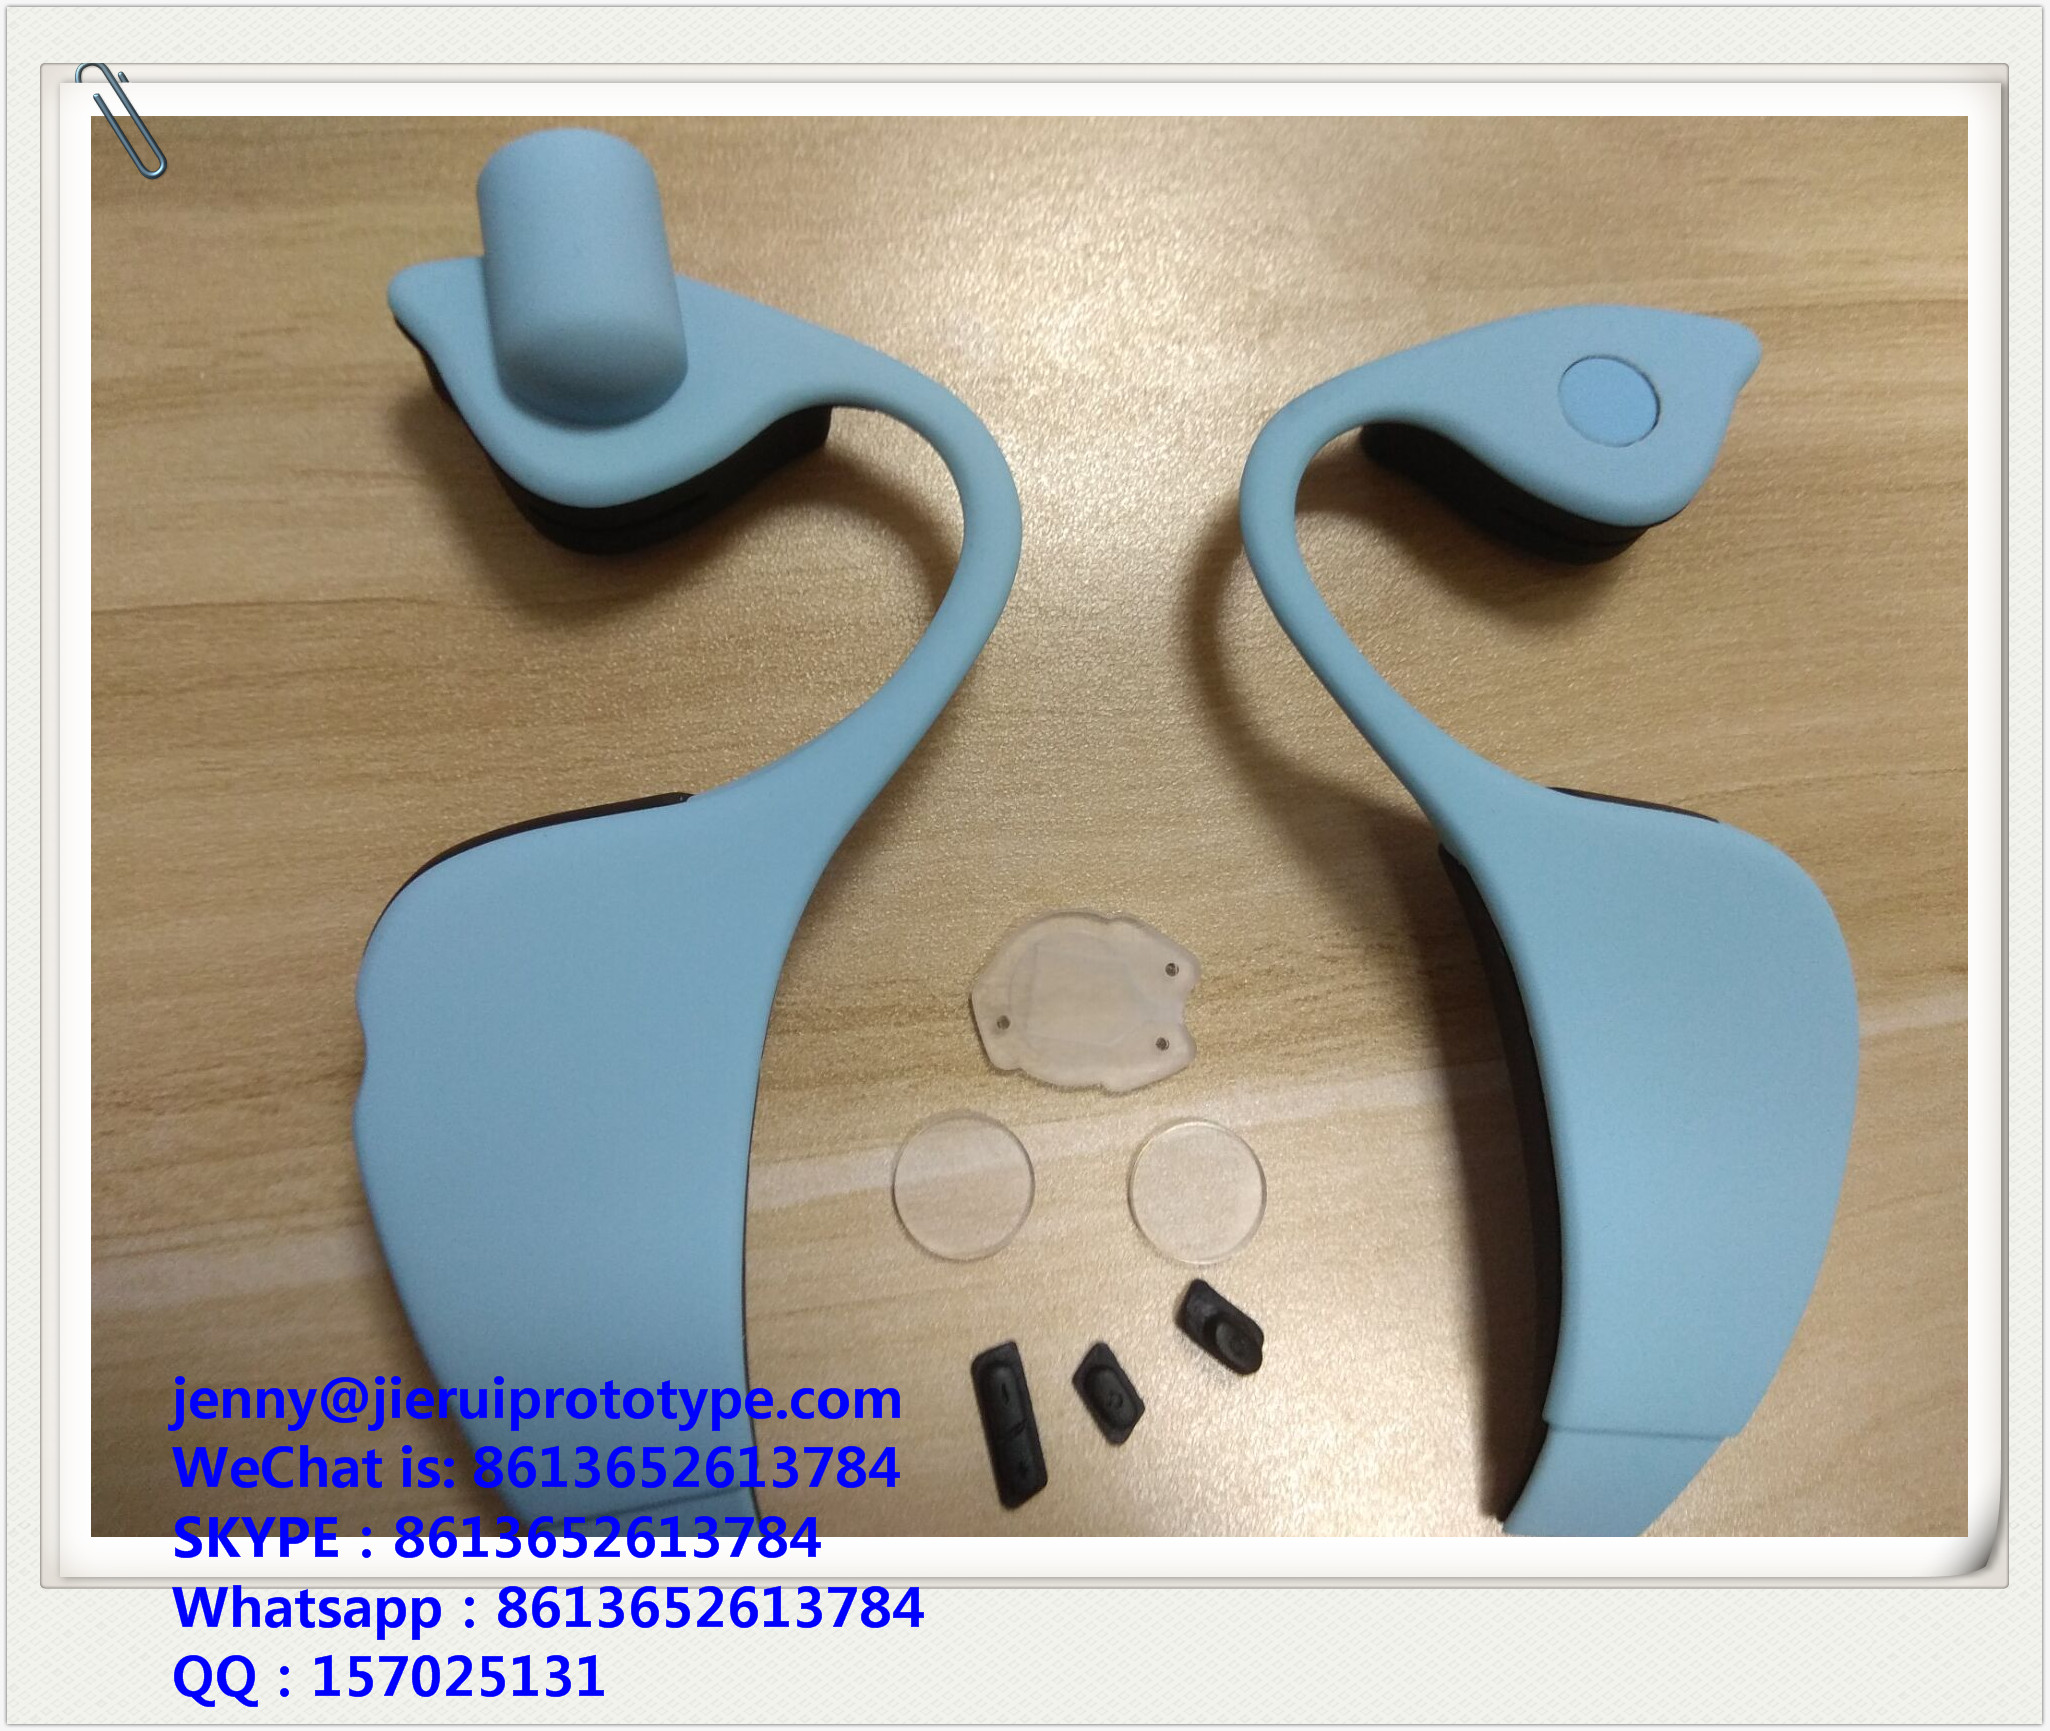 Custom Rapid Prototype By 3D Printing/CNC Machining/OEM Plastic Raid Prototype PartsCustom Rapid Prototype By 3D Printing/CNC Machining/OEM Plastic Raid Prototype Parts